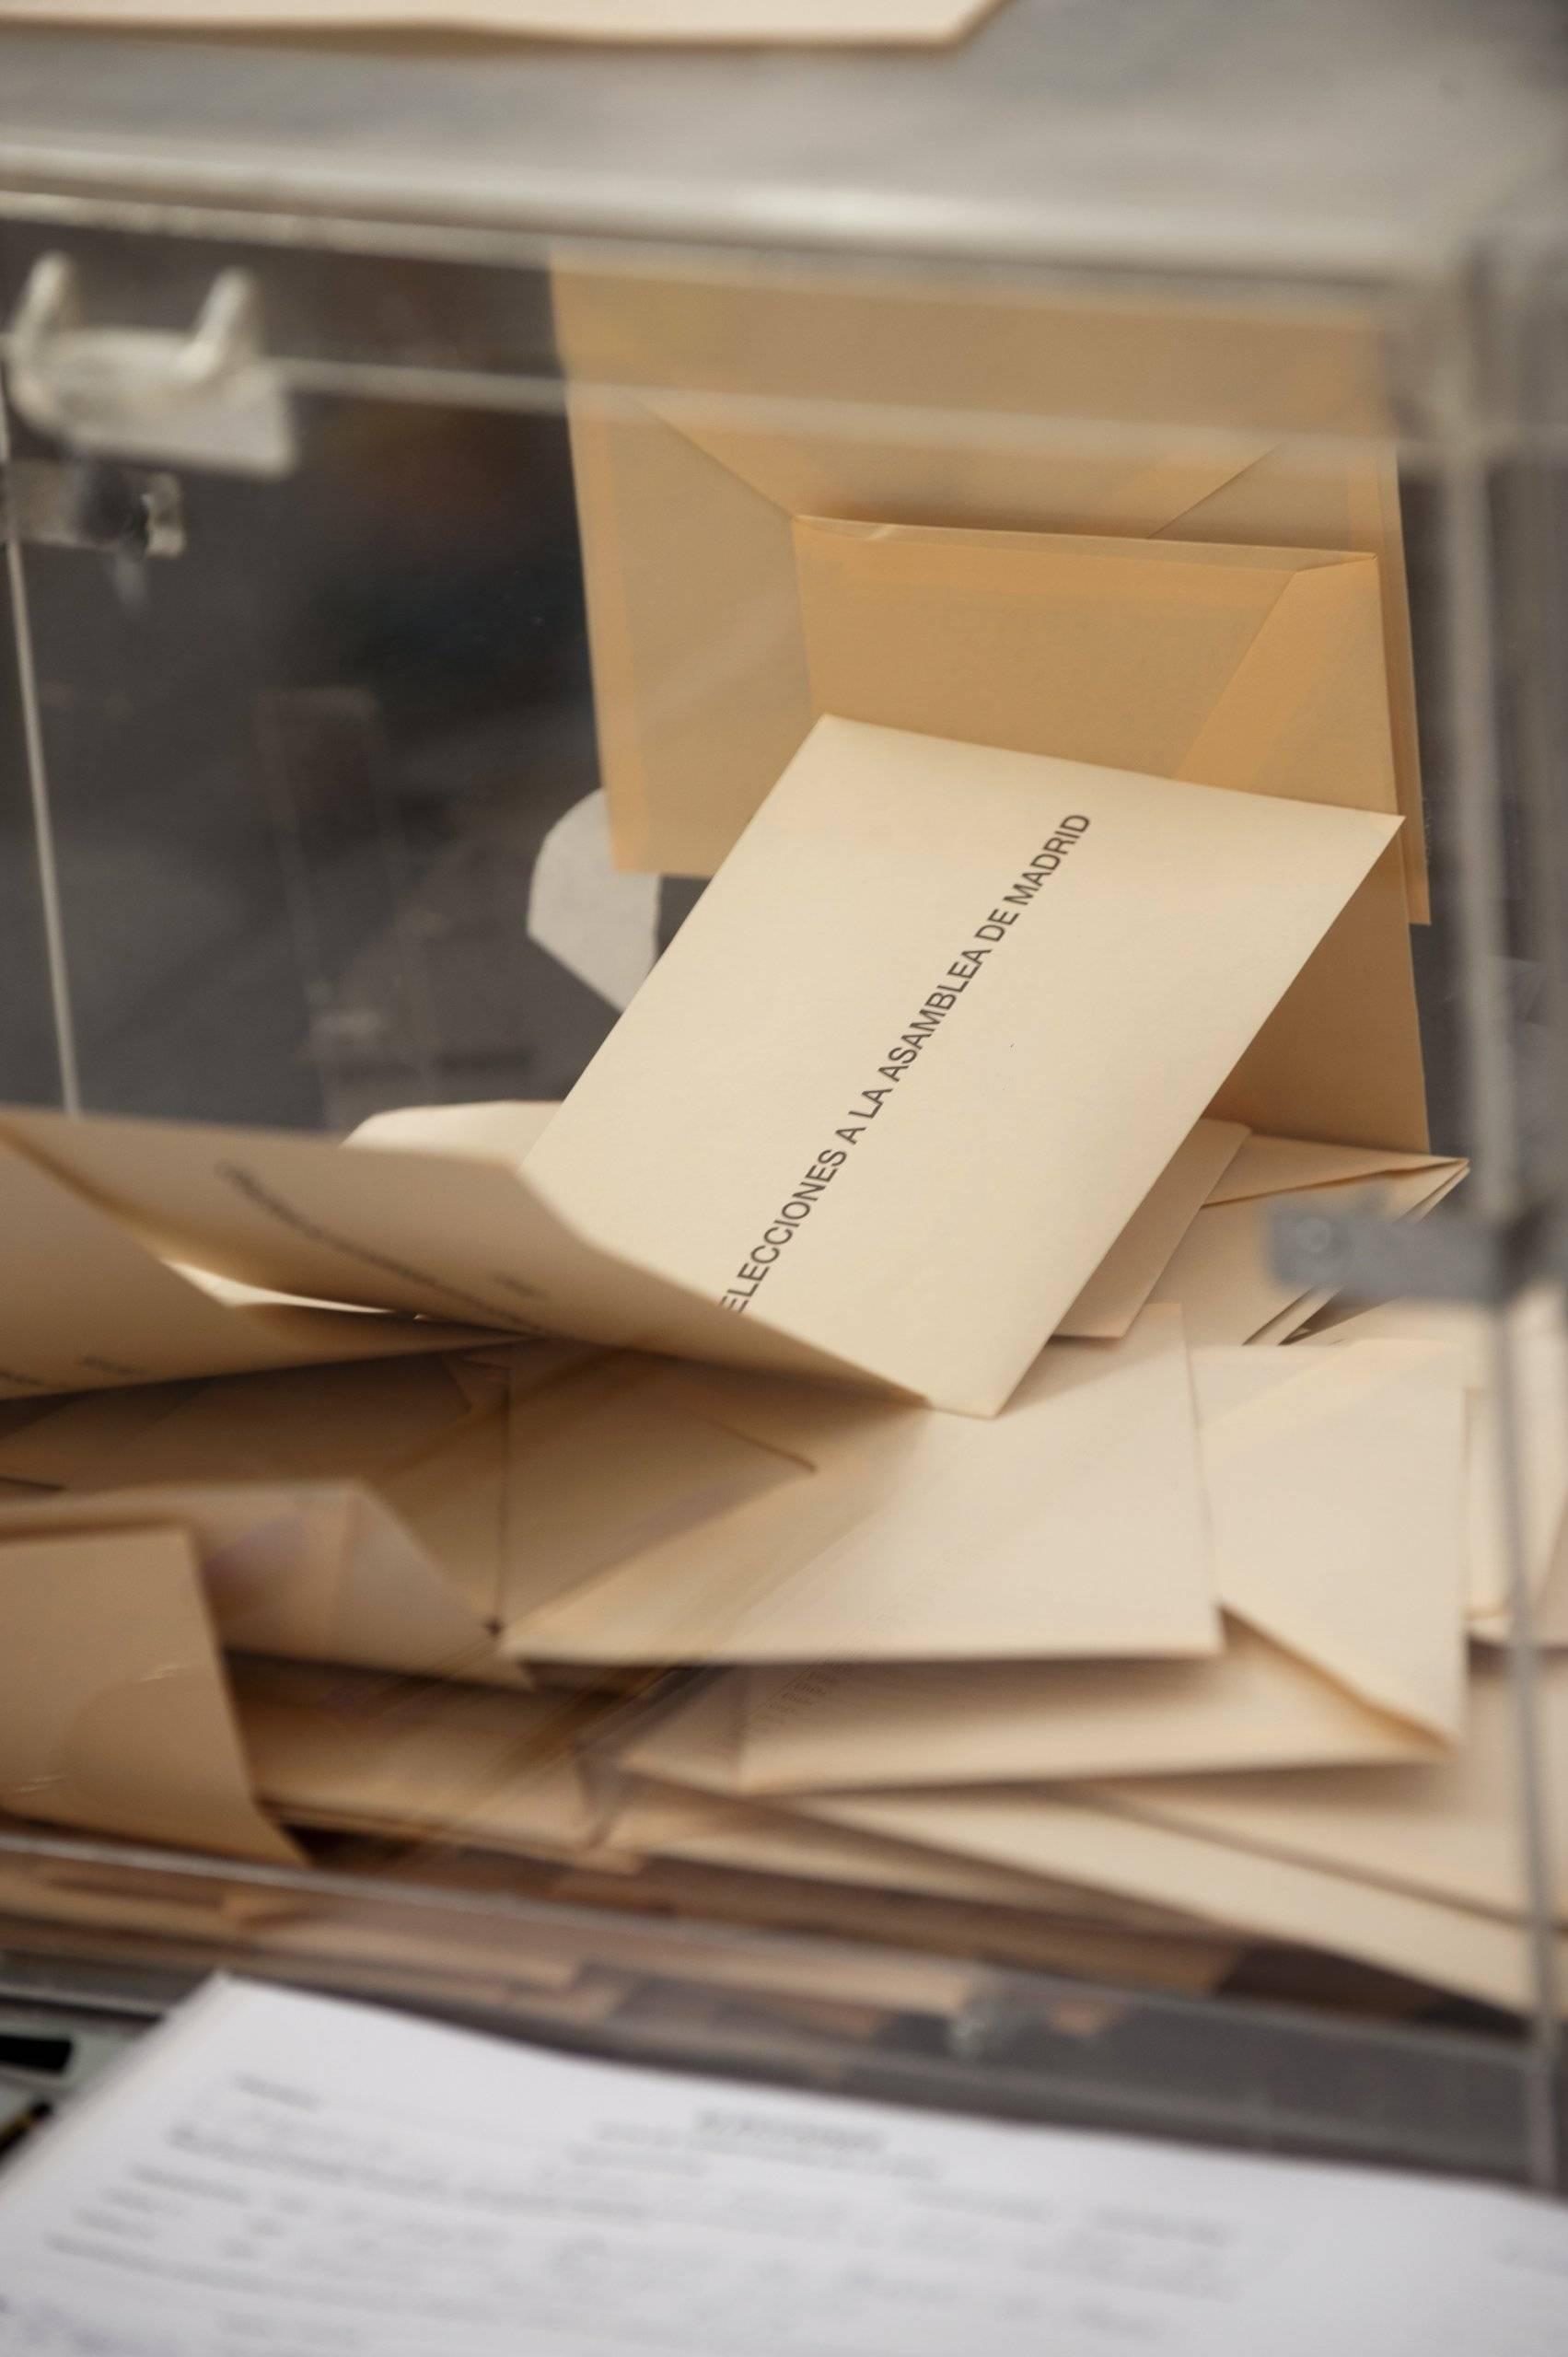 Urna con votos en sobres de color sepia.